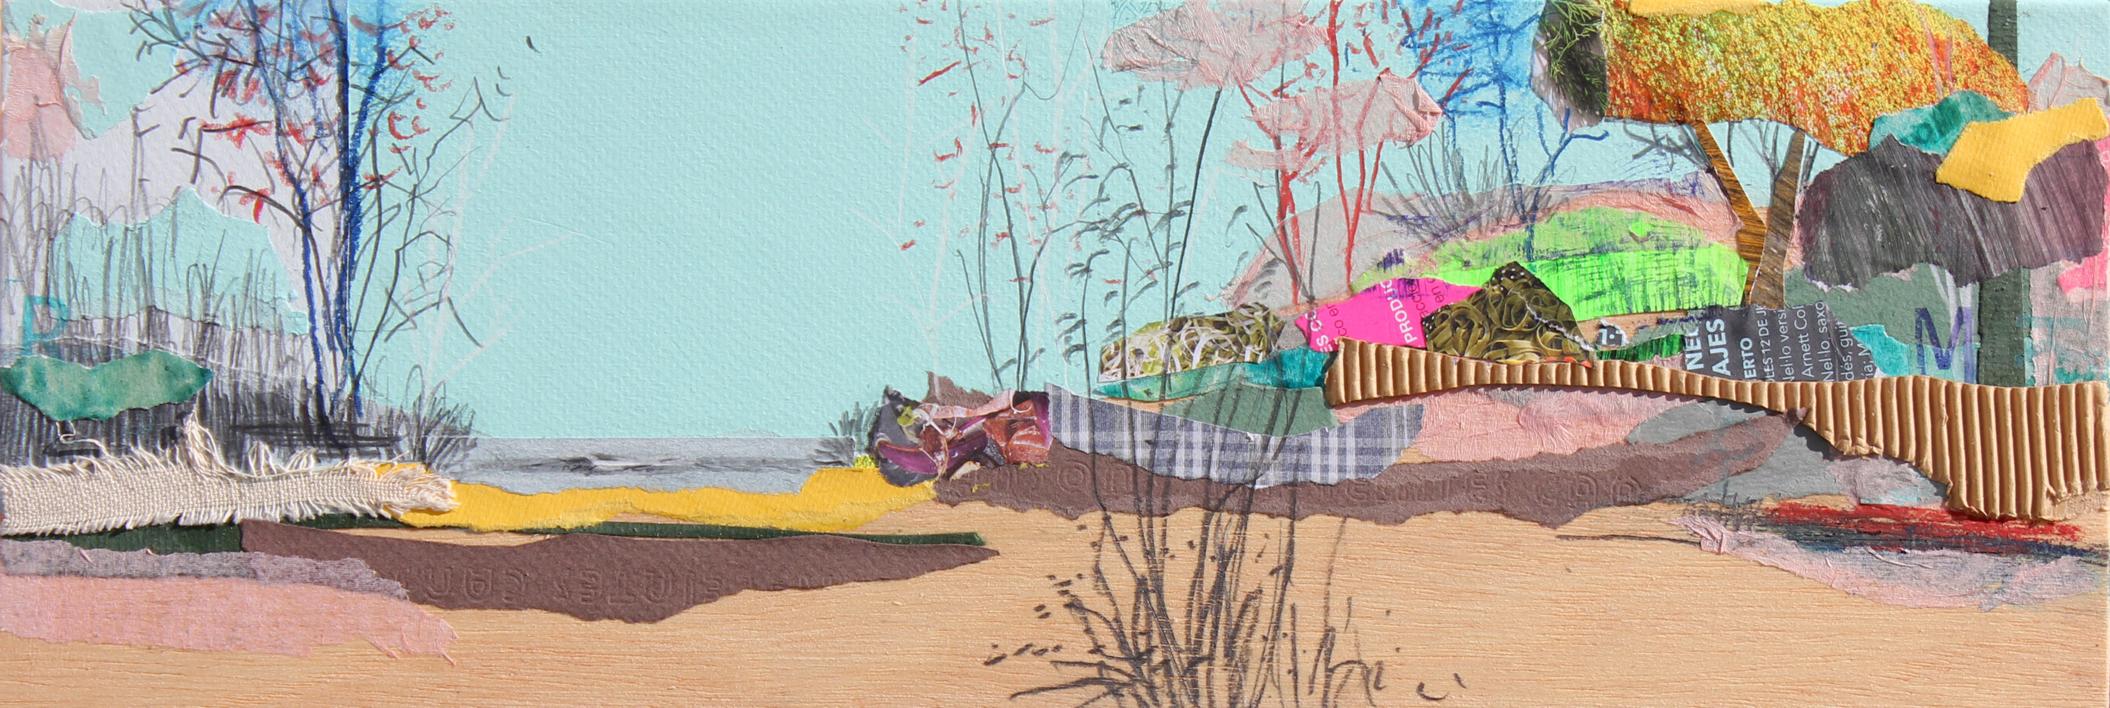 Selva  Dibujo de Eduardo Query   Compra arte en Flecha.es